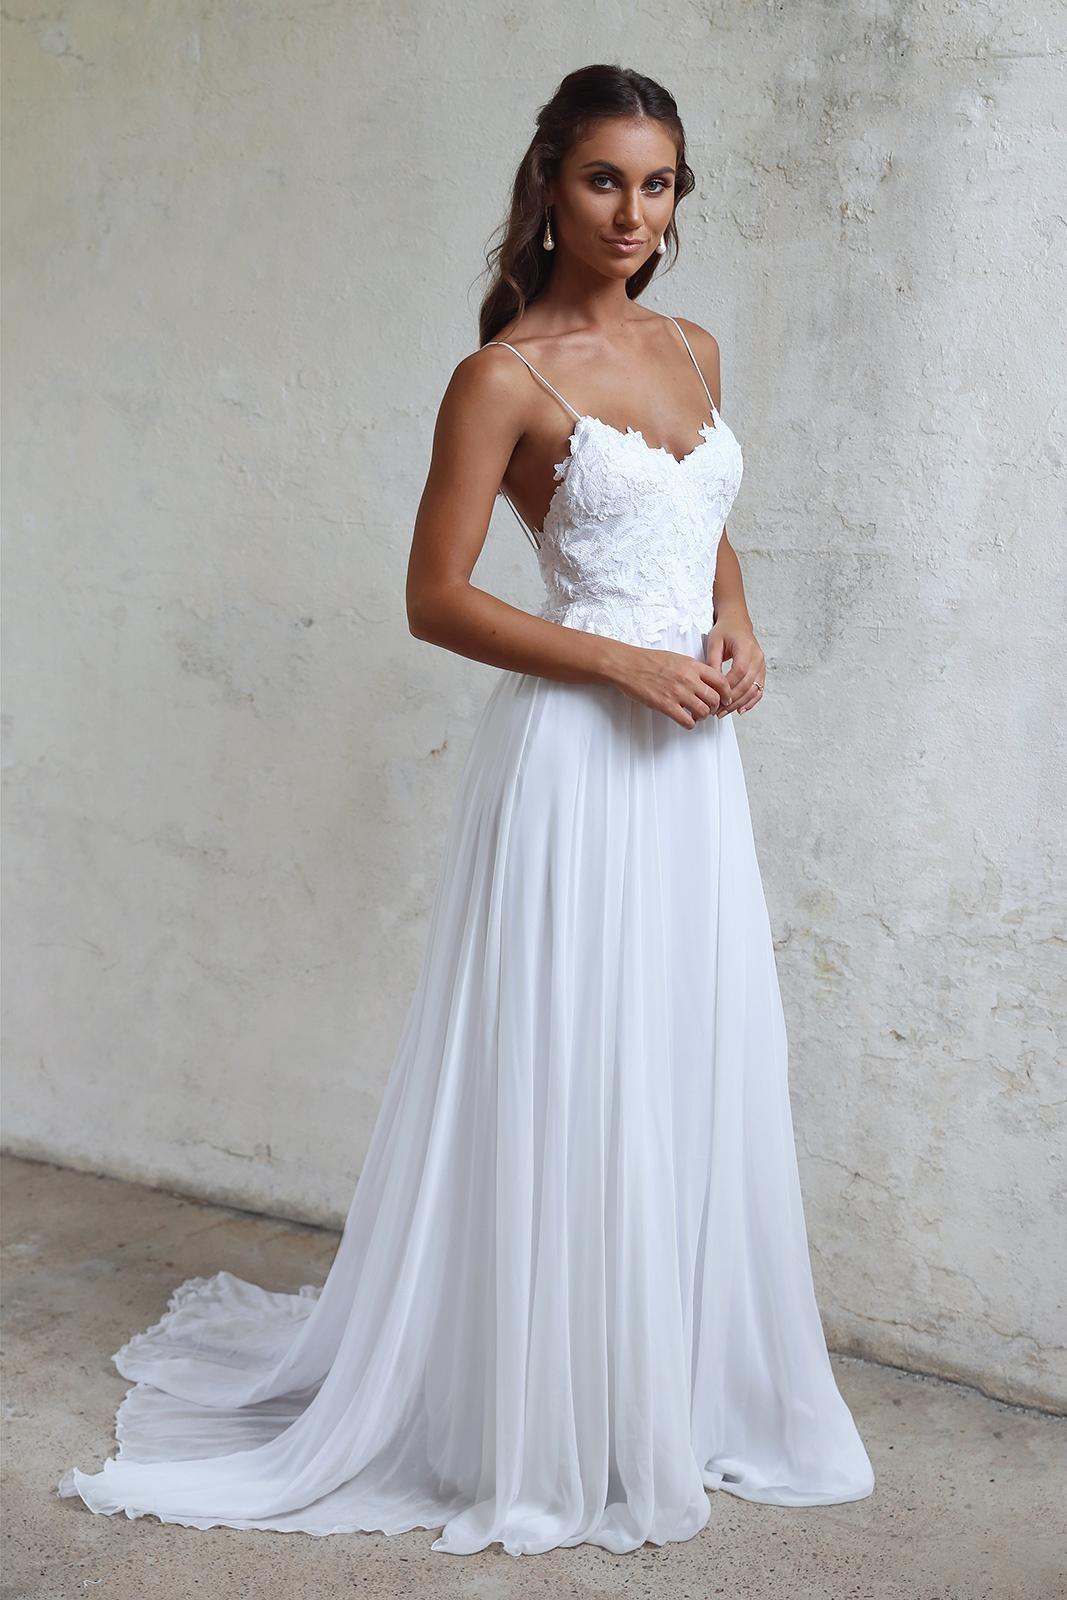 Spaghetti Strap Wedding Dresses  Simple A line Spaghetti Straps Open Back Summer Wedding Dress